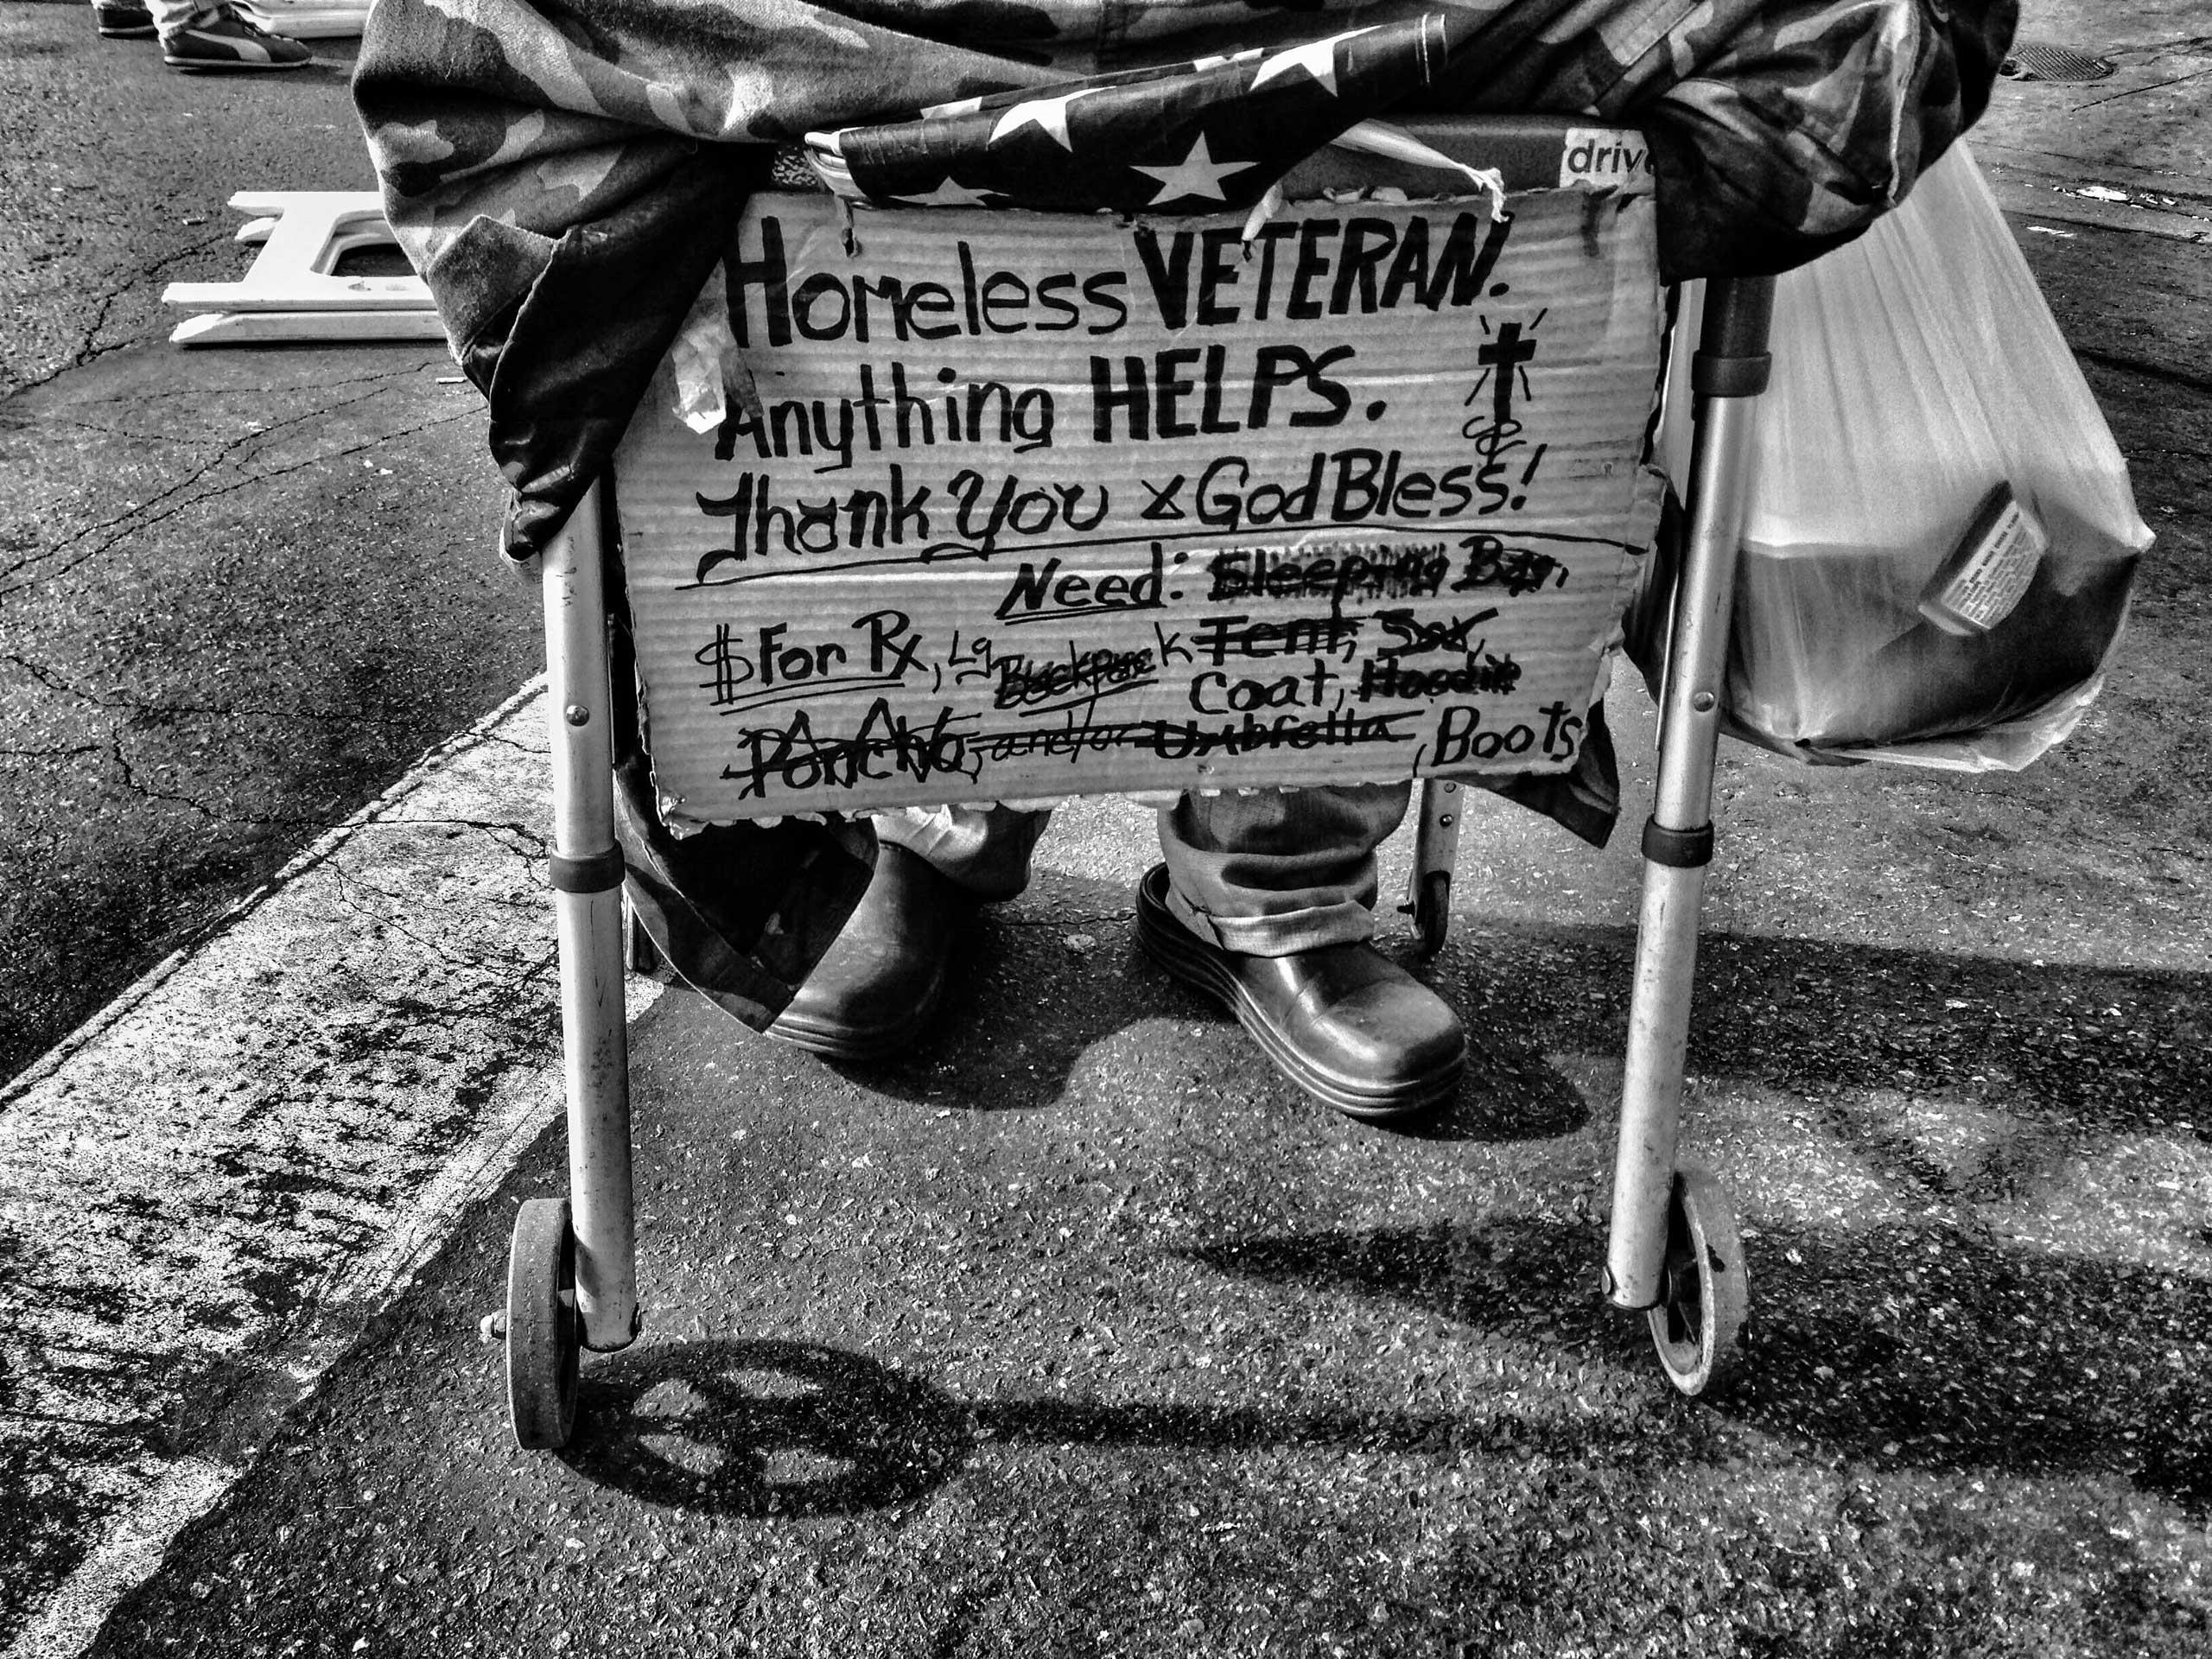 Nov. 27, 2013. San Julian Street, Los Angeles. Billy, an injured Iraq War veteran, uses a walker to help him recover from a fractured hip.